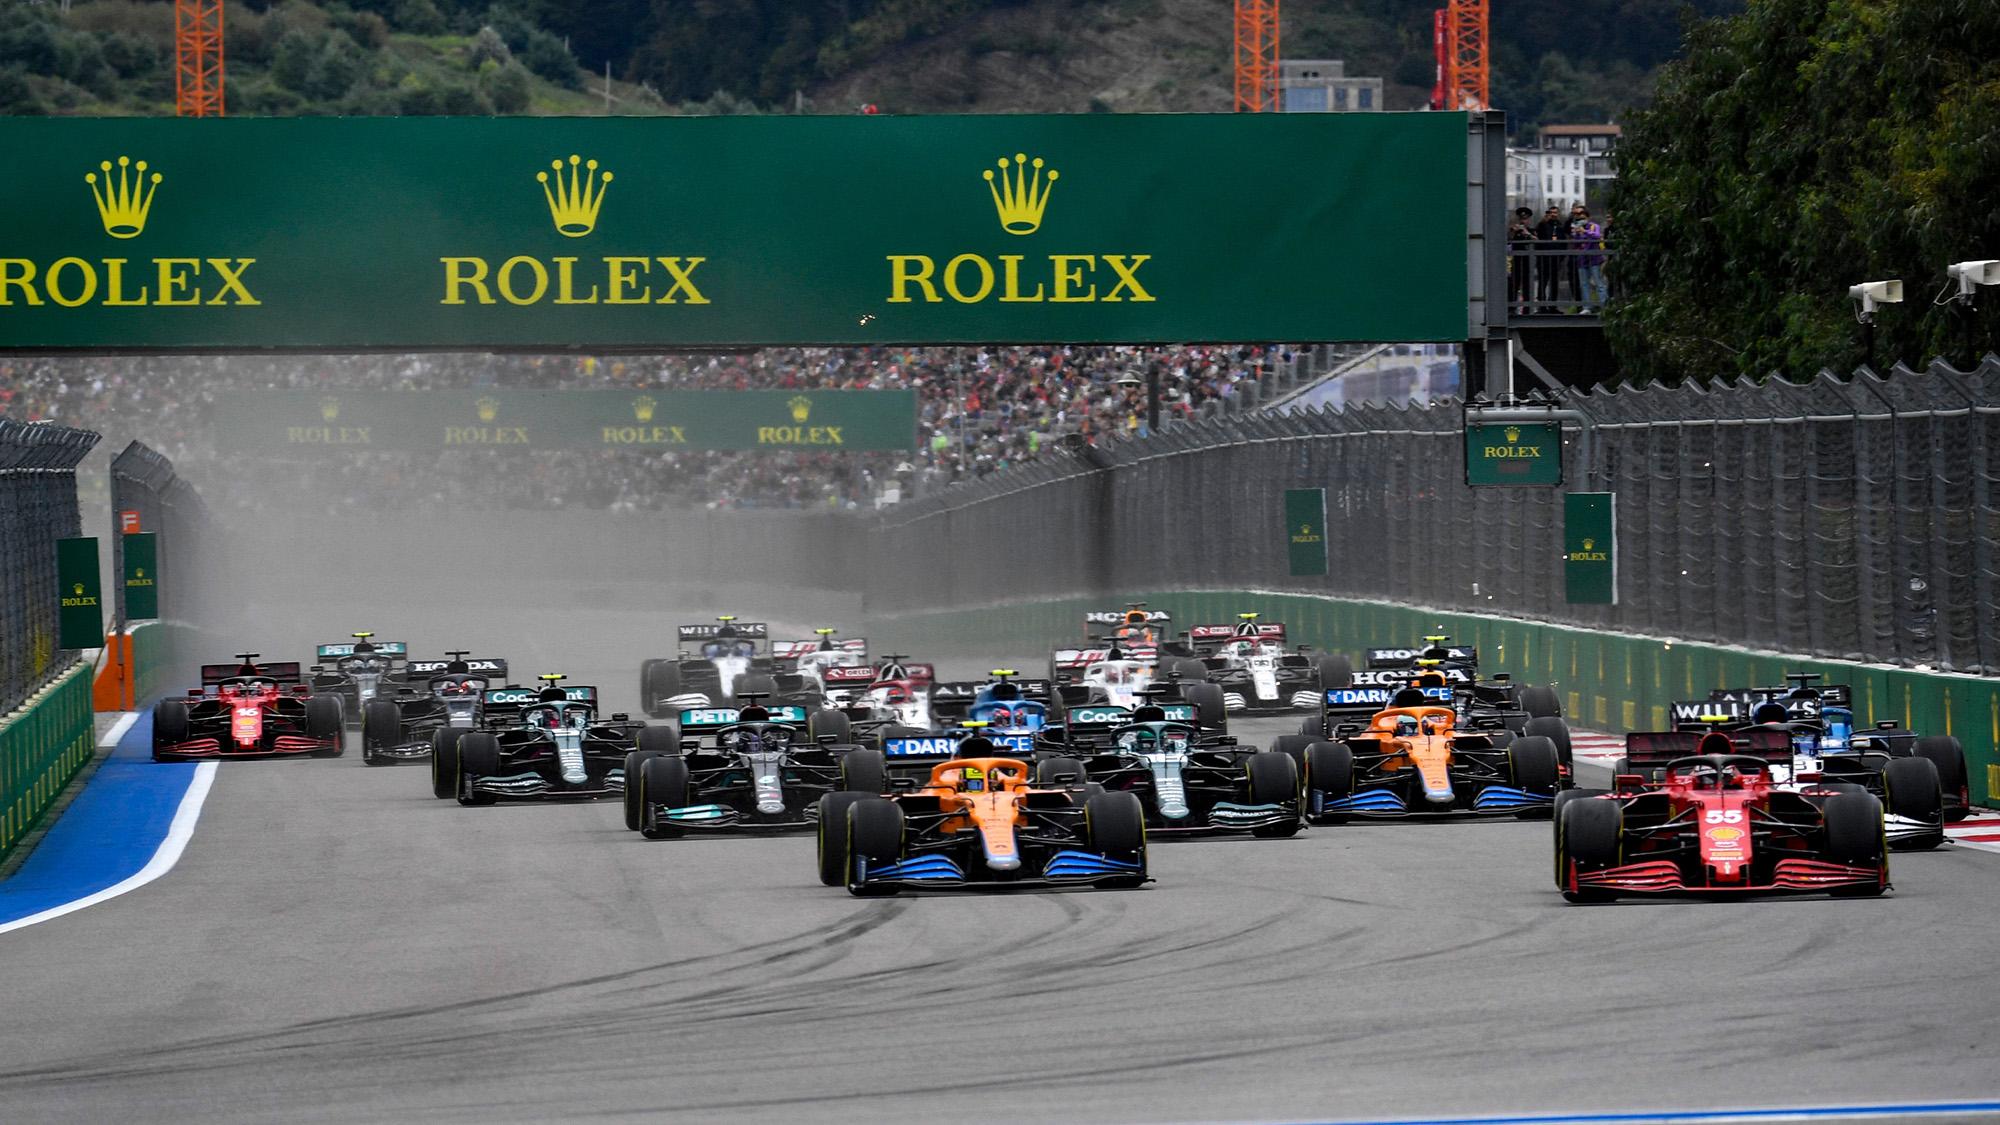 Start of 2021 Russian GP